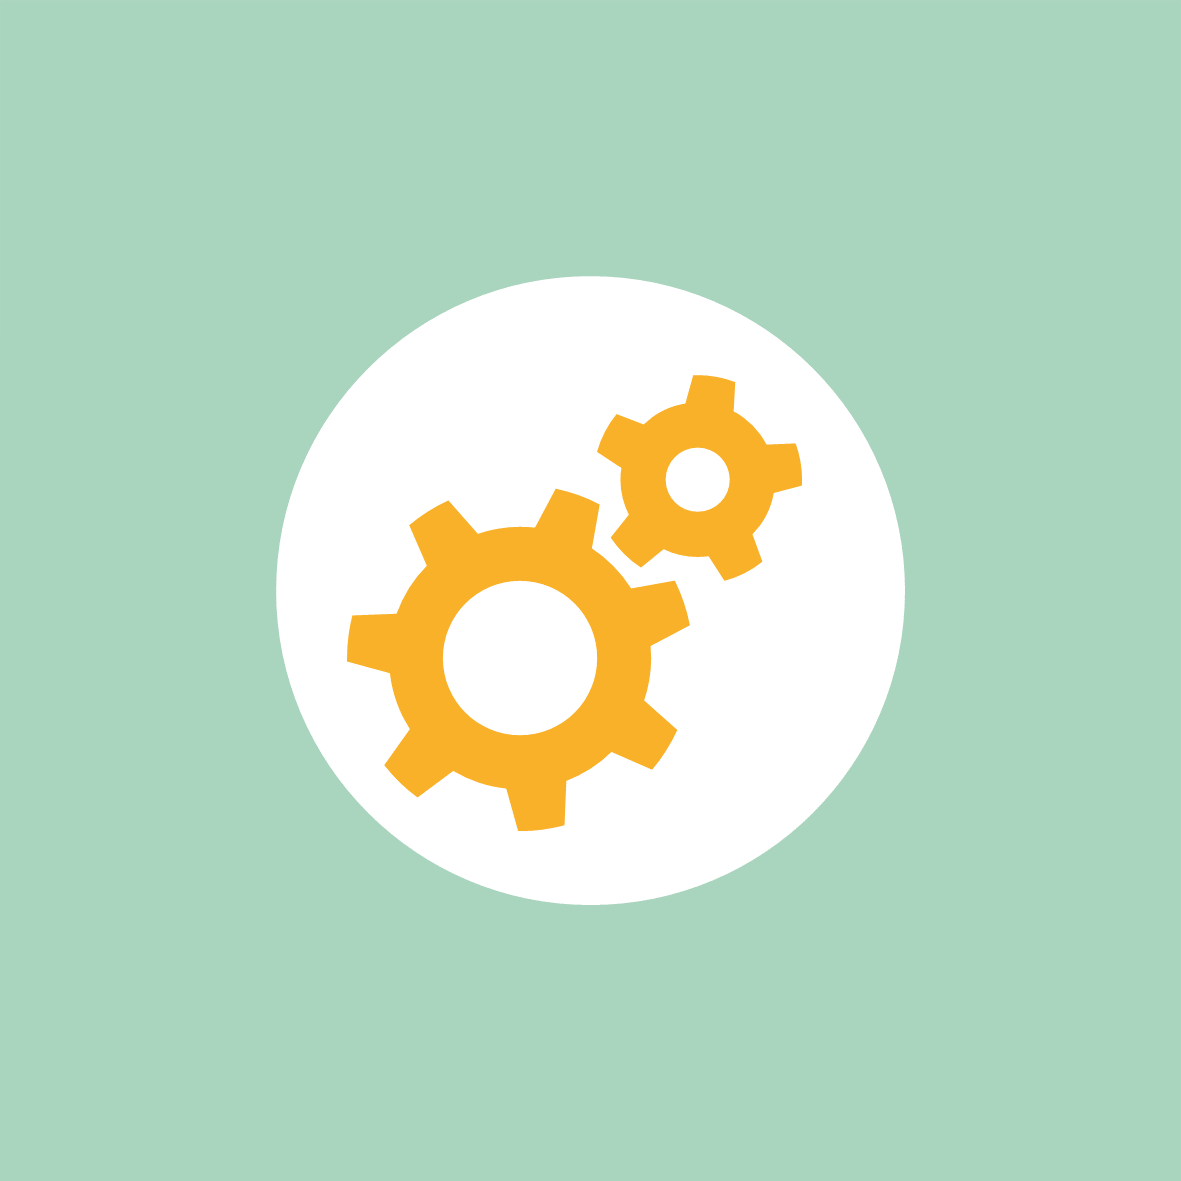 produktion-ikon.png